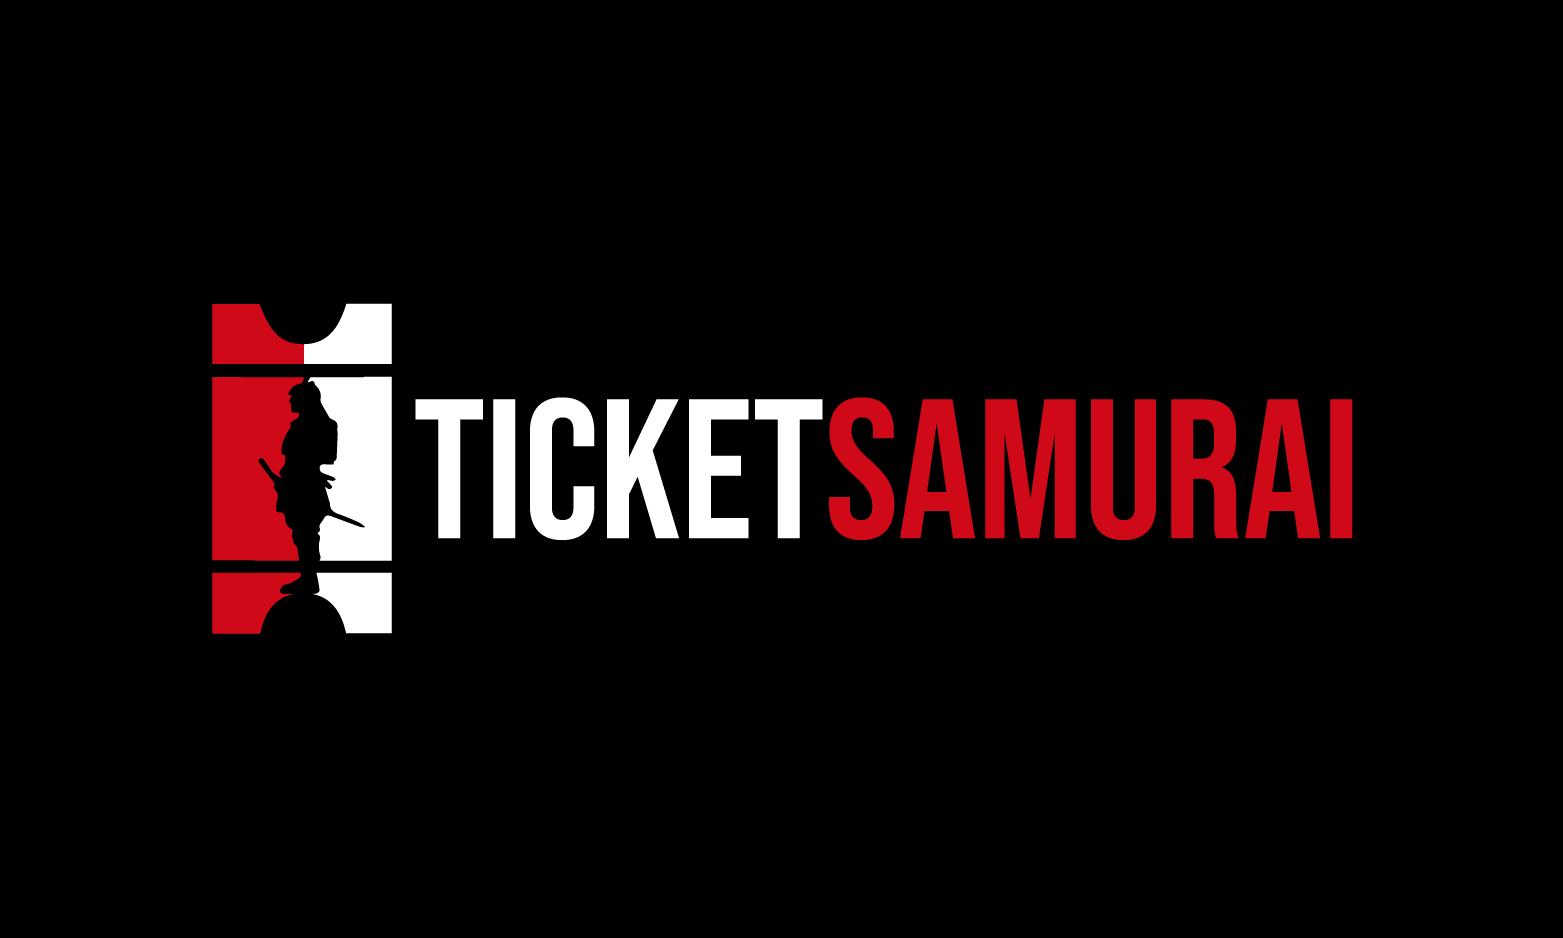 TicketSamurai.com